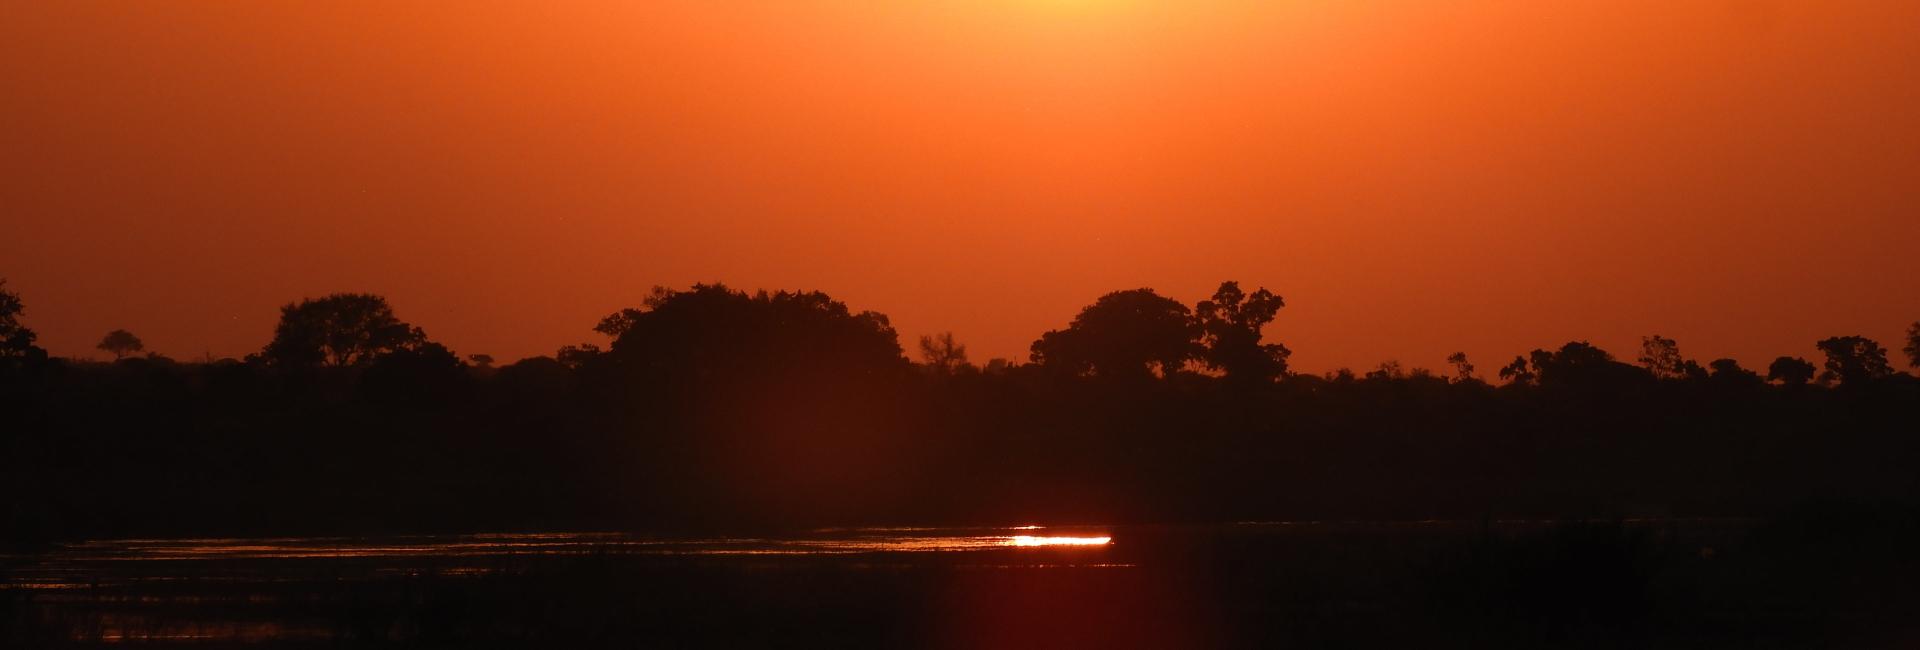 Zuid-Afrika zon